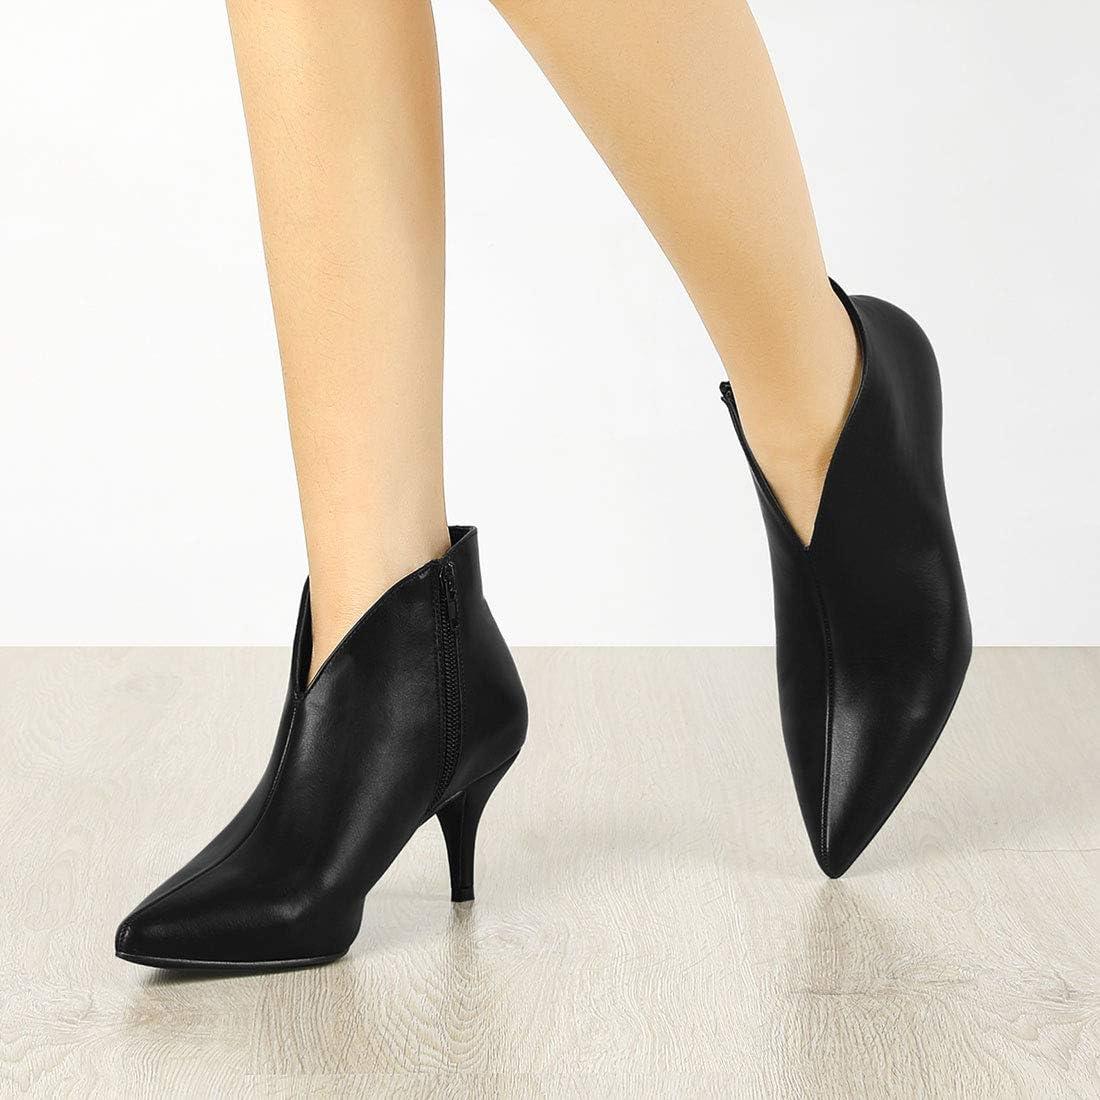 Allegra K Women's Cutout Pointy Toe Stiletto Heels Boots Ankle Booties